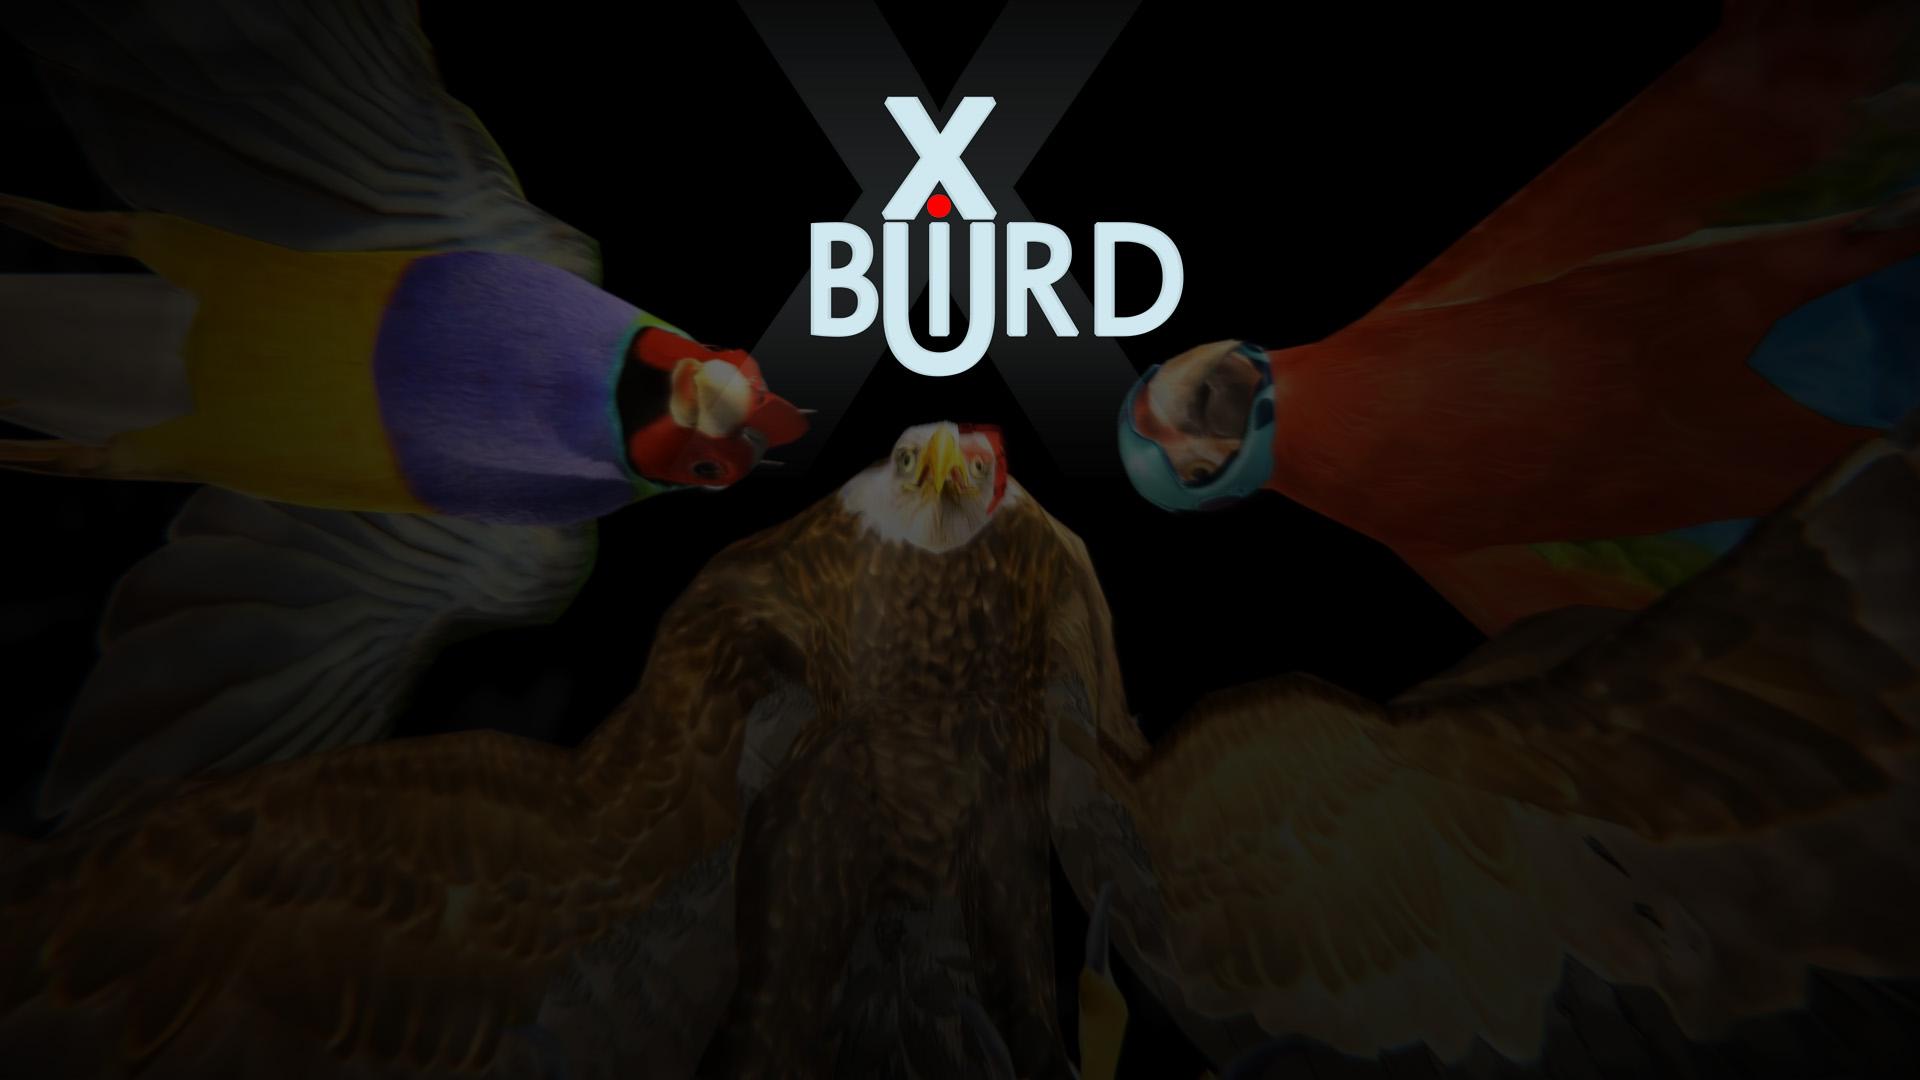 Xbird11